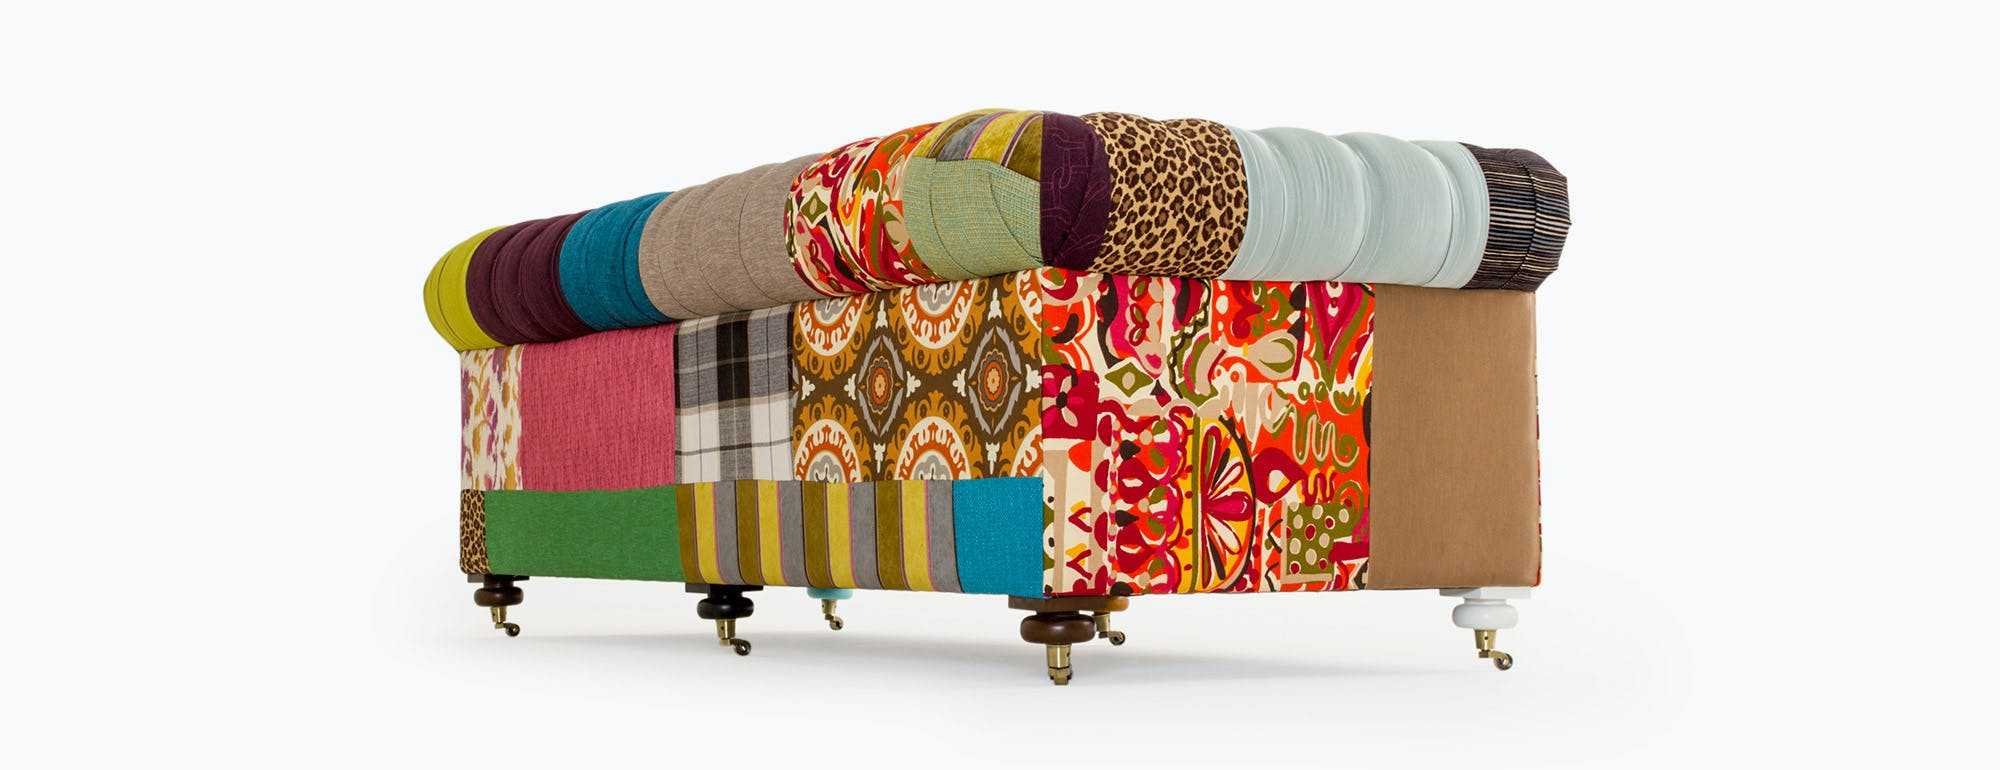 Liam Patchwork Sofa Joybird : hero liam patchwork sofa 4 from joybird.com size 2000 x 770 jpeg 118kB